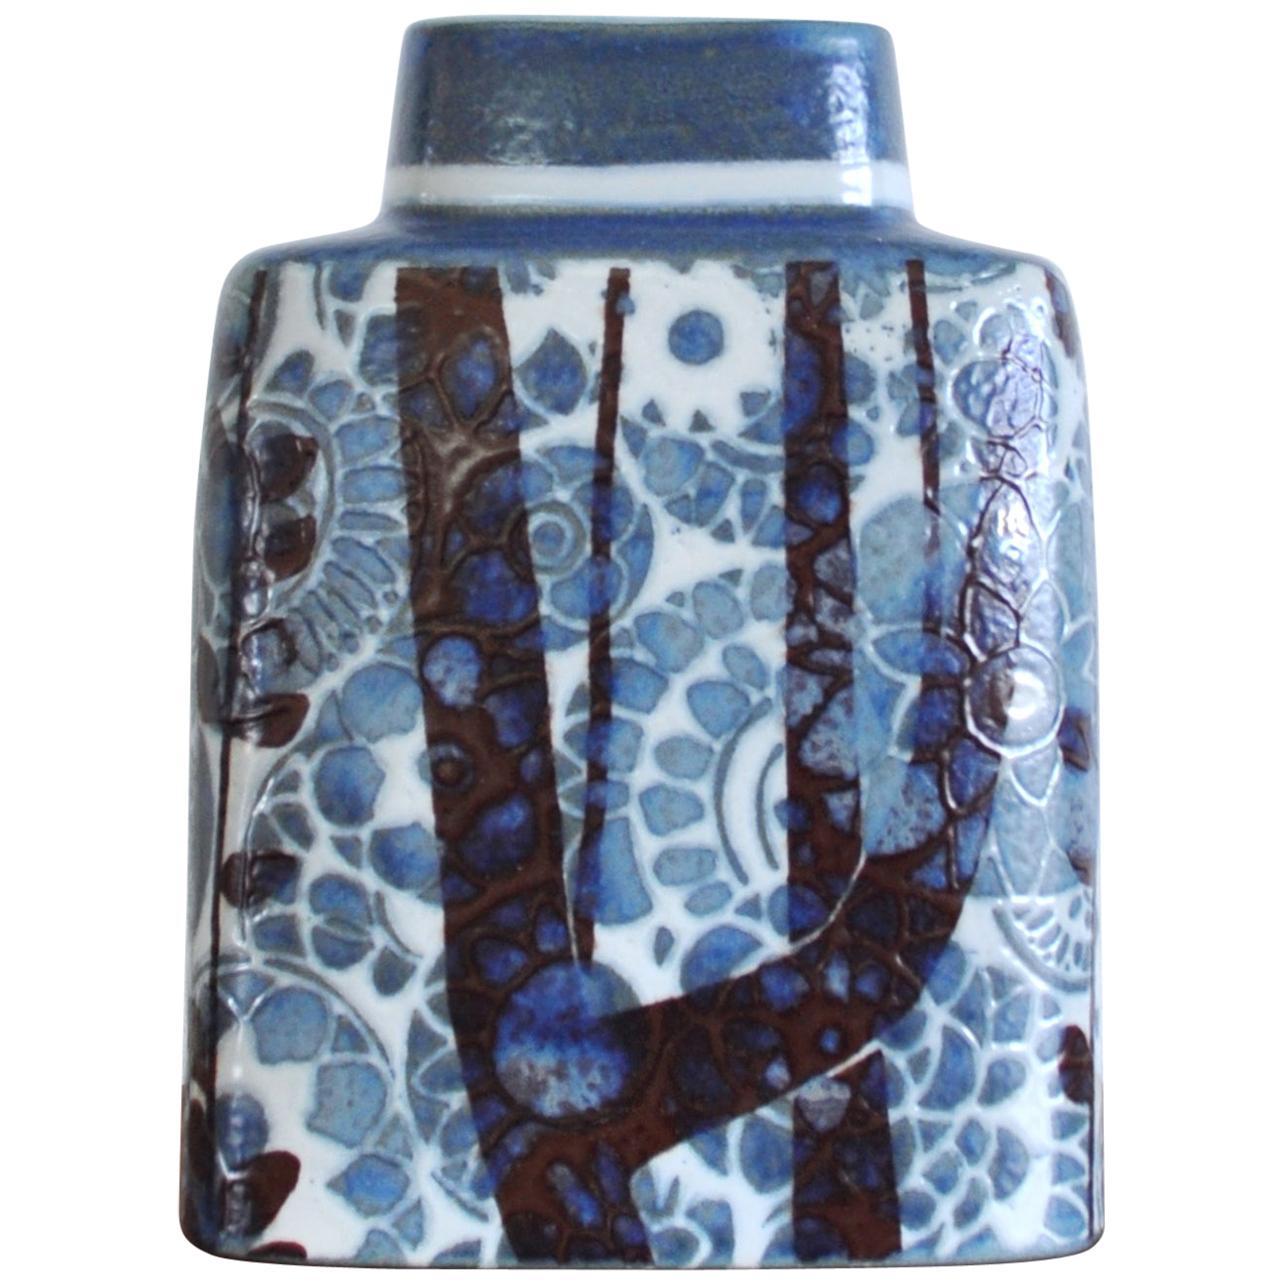 Fajance Vase by Johanne Gerber Royal Copenhagen